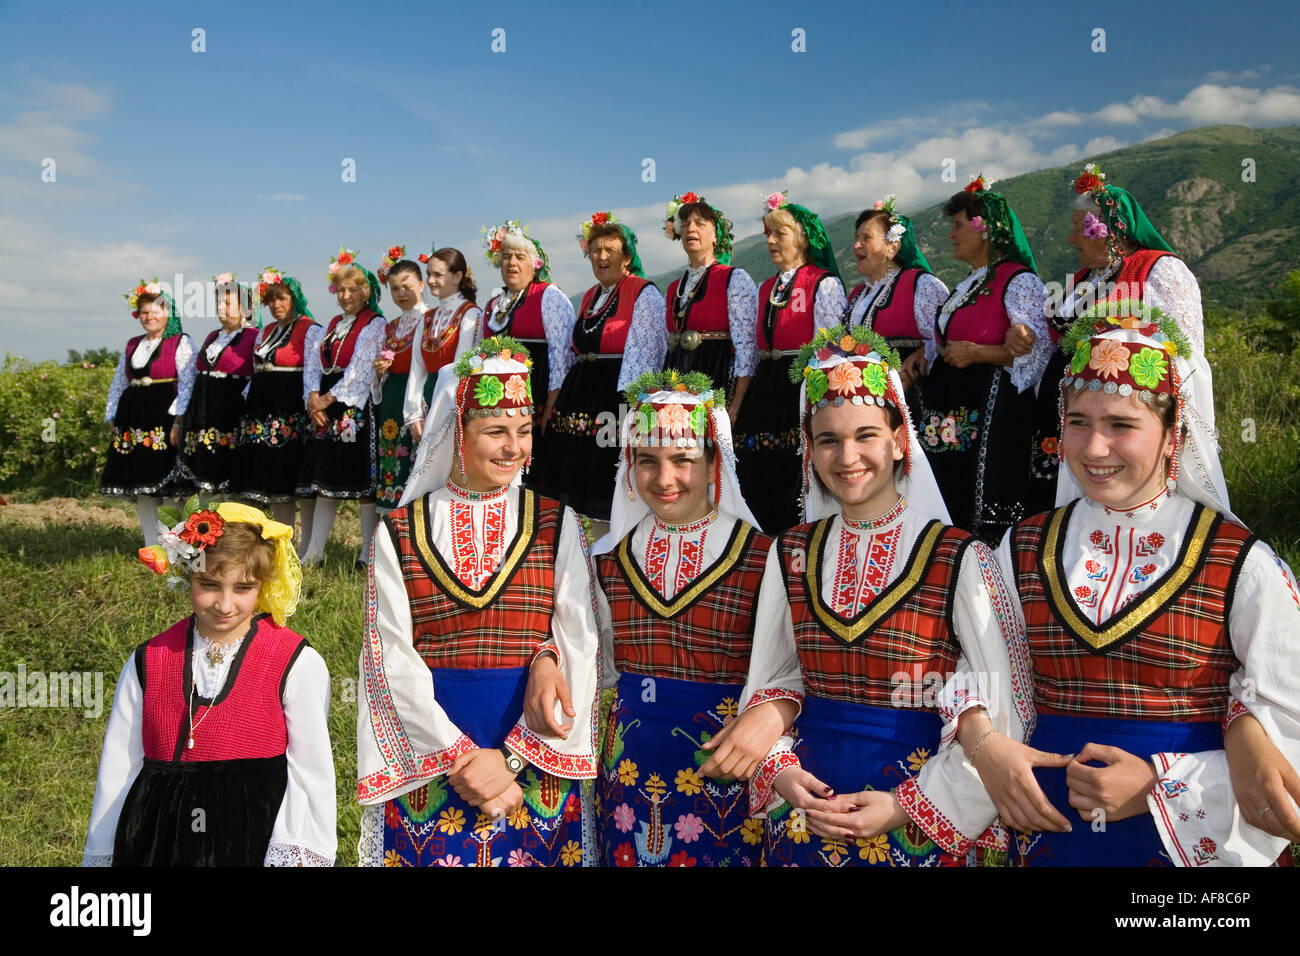 Folklore Group, Rose Festival, Karlovo, Bulgaria - Stock Image